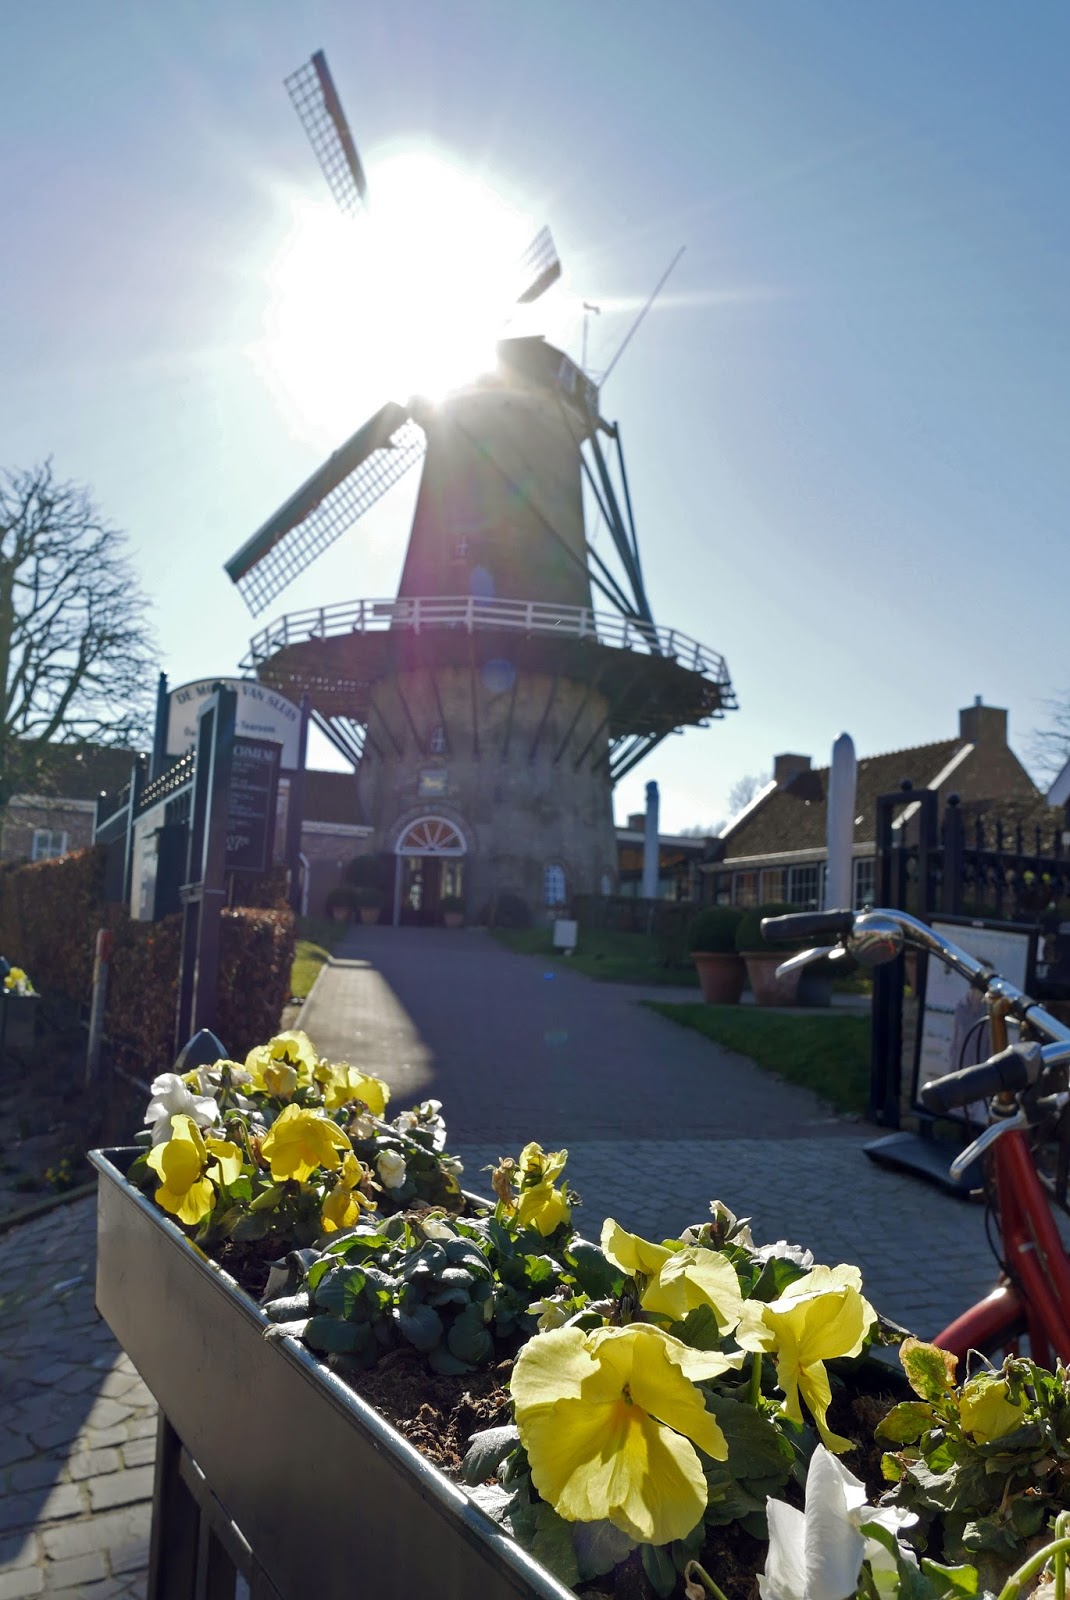 Windmill in Sluis, The Netherlands